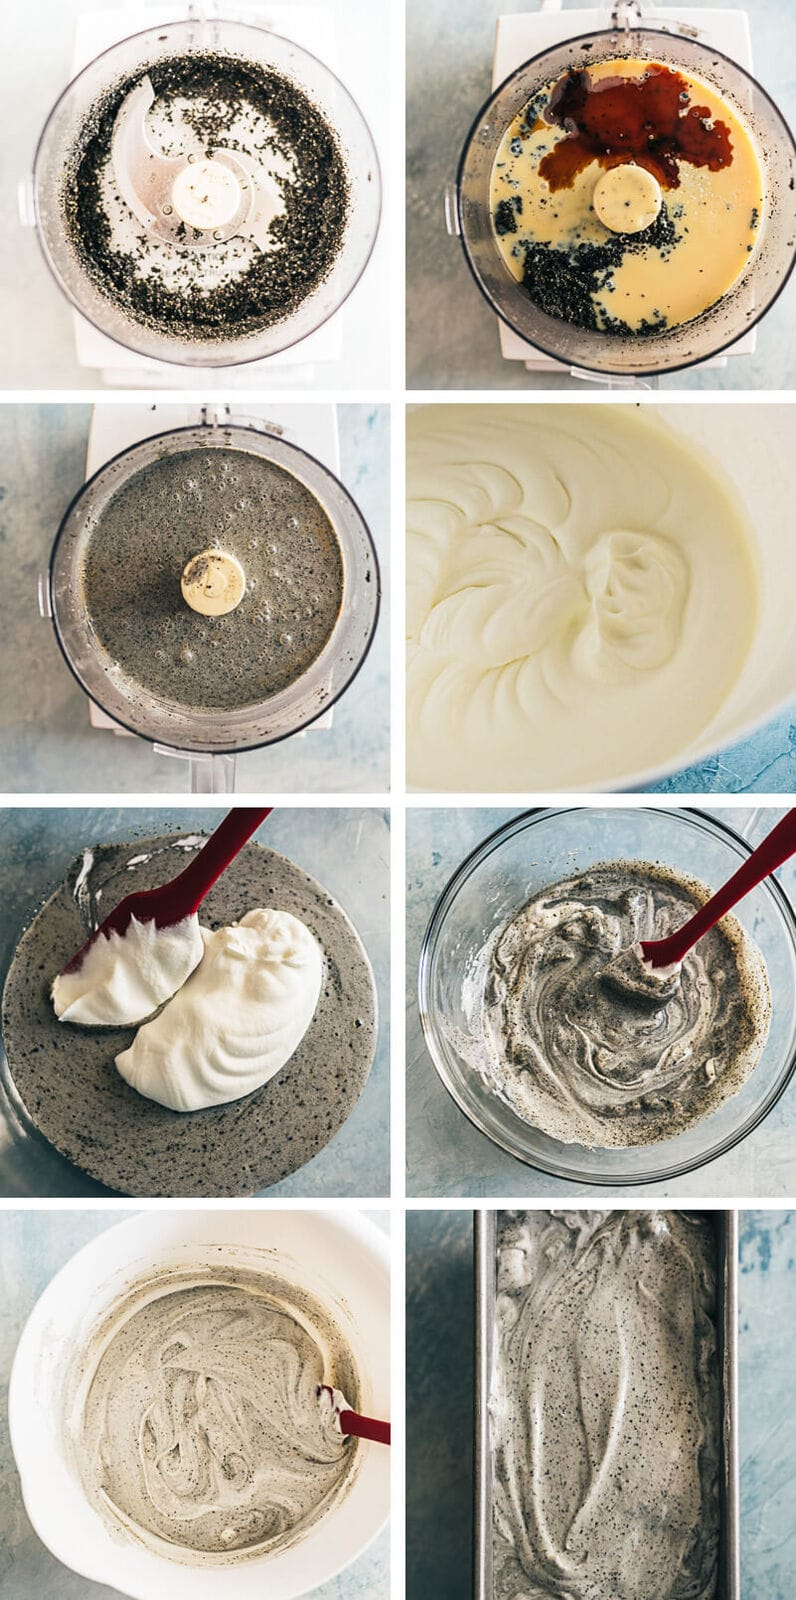 4-Ingredient No-Churn Black Sesame Ice Cream Cooking Process